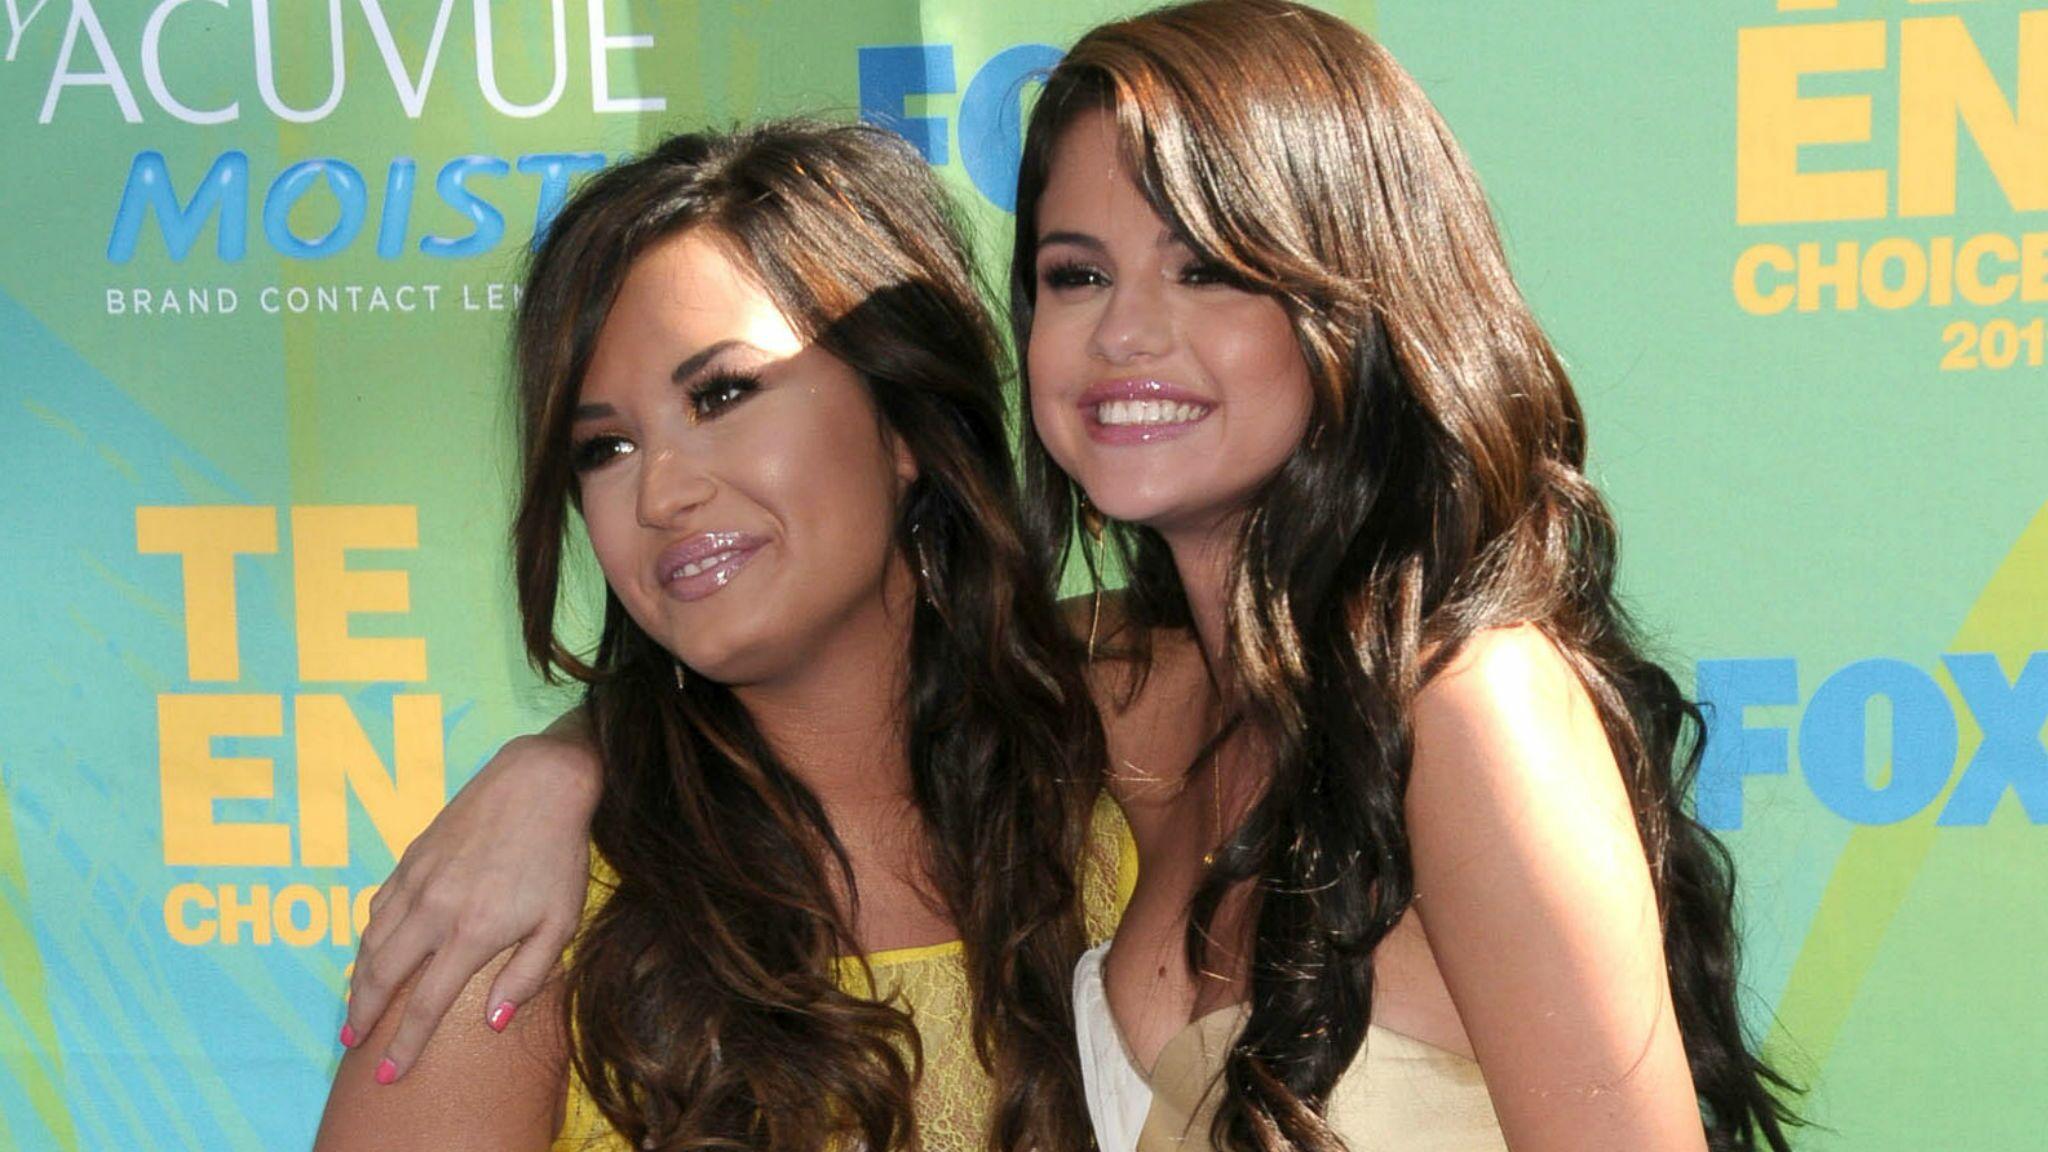 Qui est Demi Lovato datant maintenant 2016